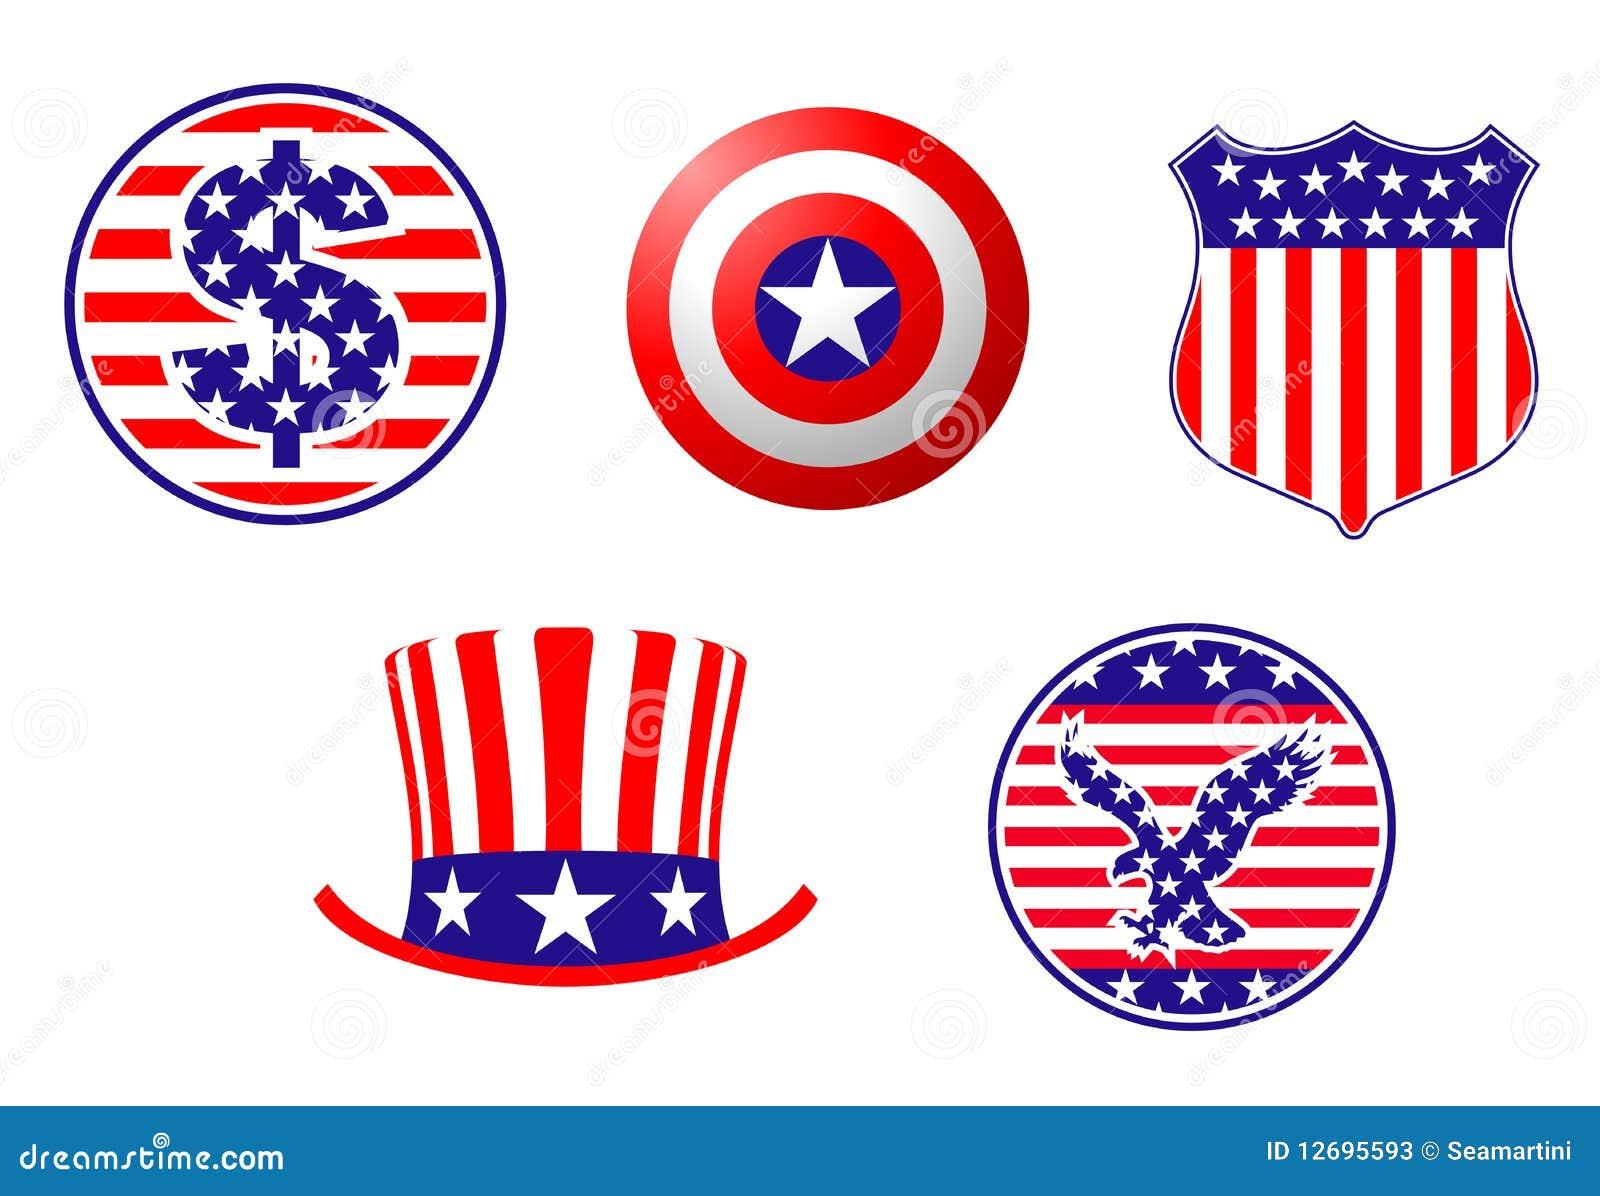 american patriotic symbols stock vector image of flag